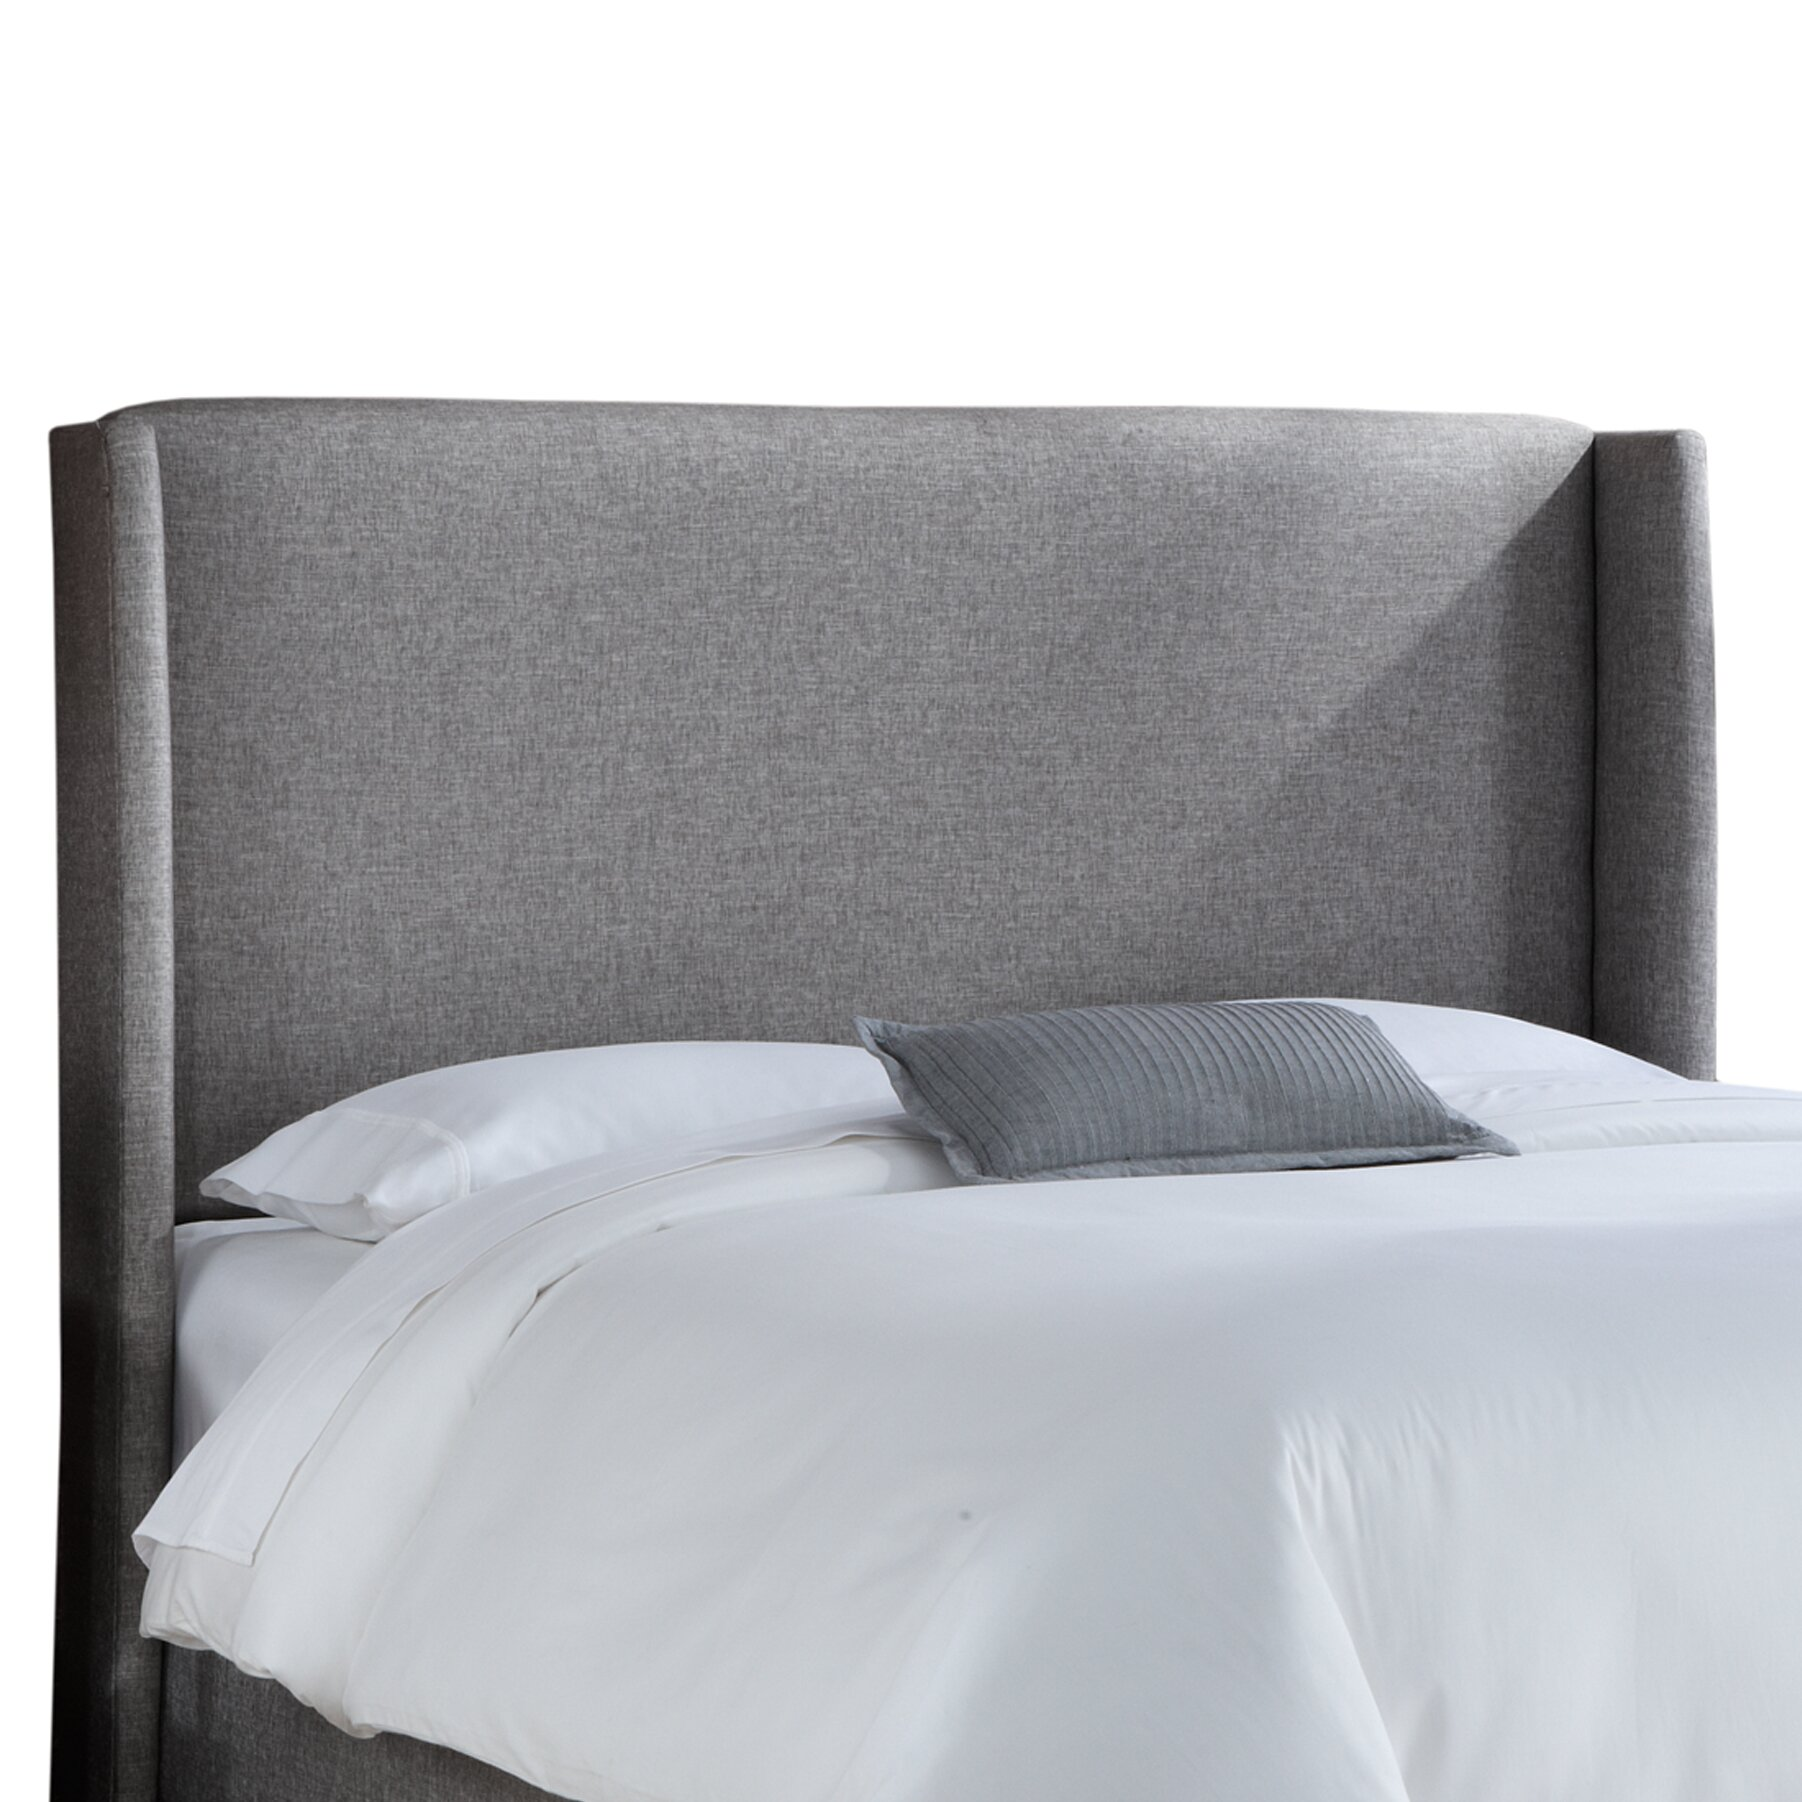 Skyline Bedroom Furniture Skyline Furniture Wingback Upholstered Headboard Reviews Wayfair